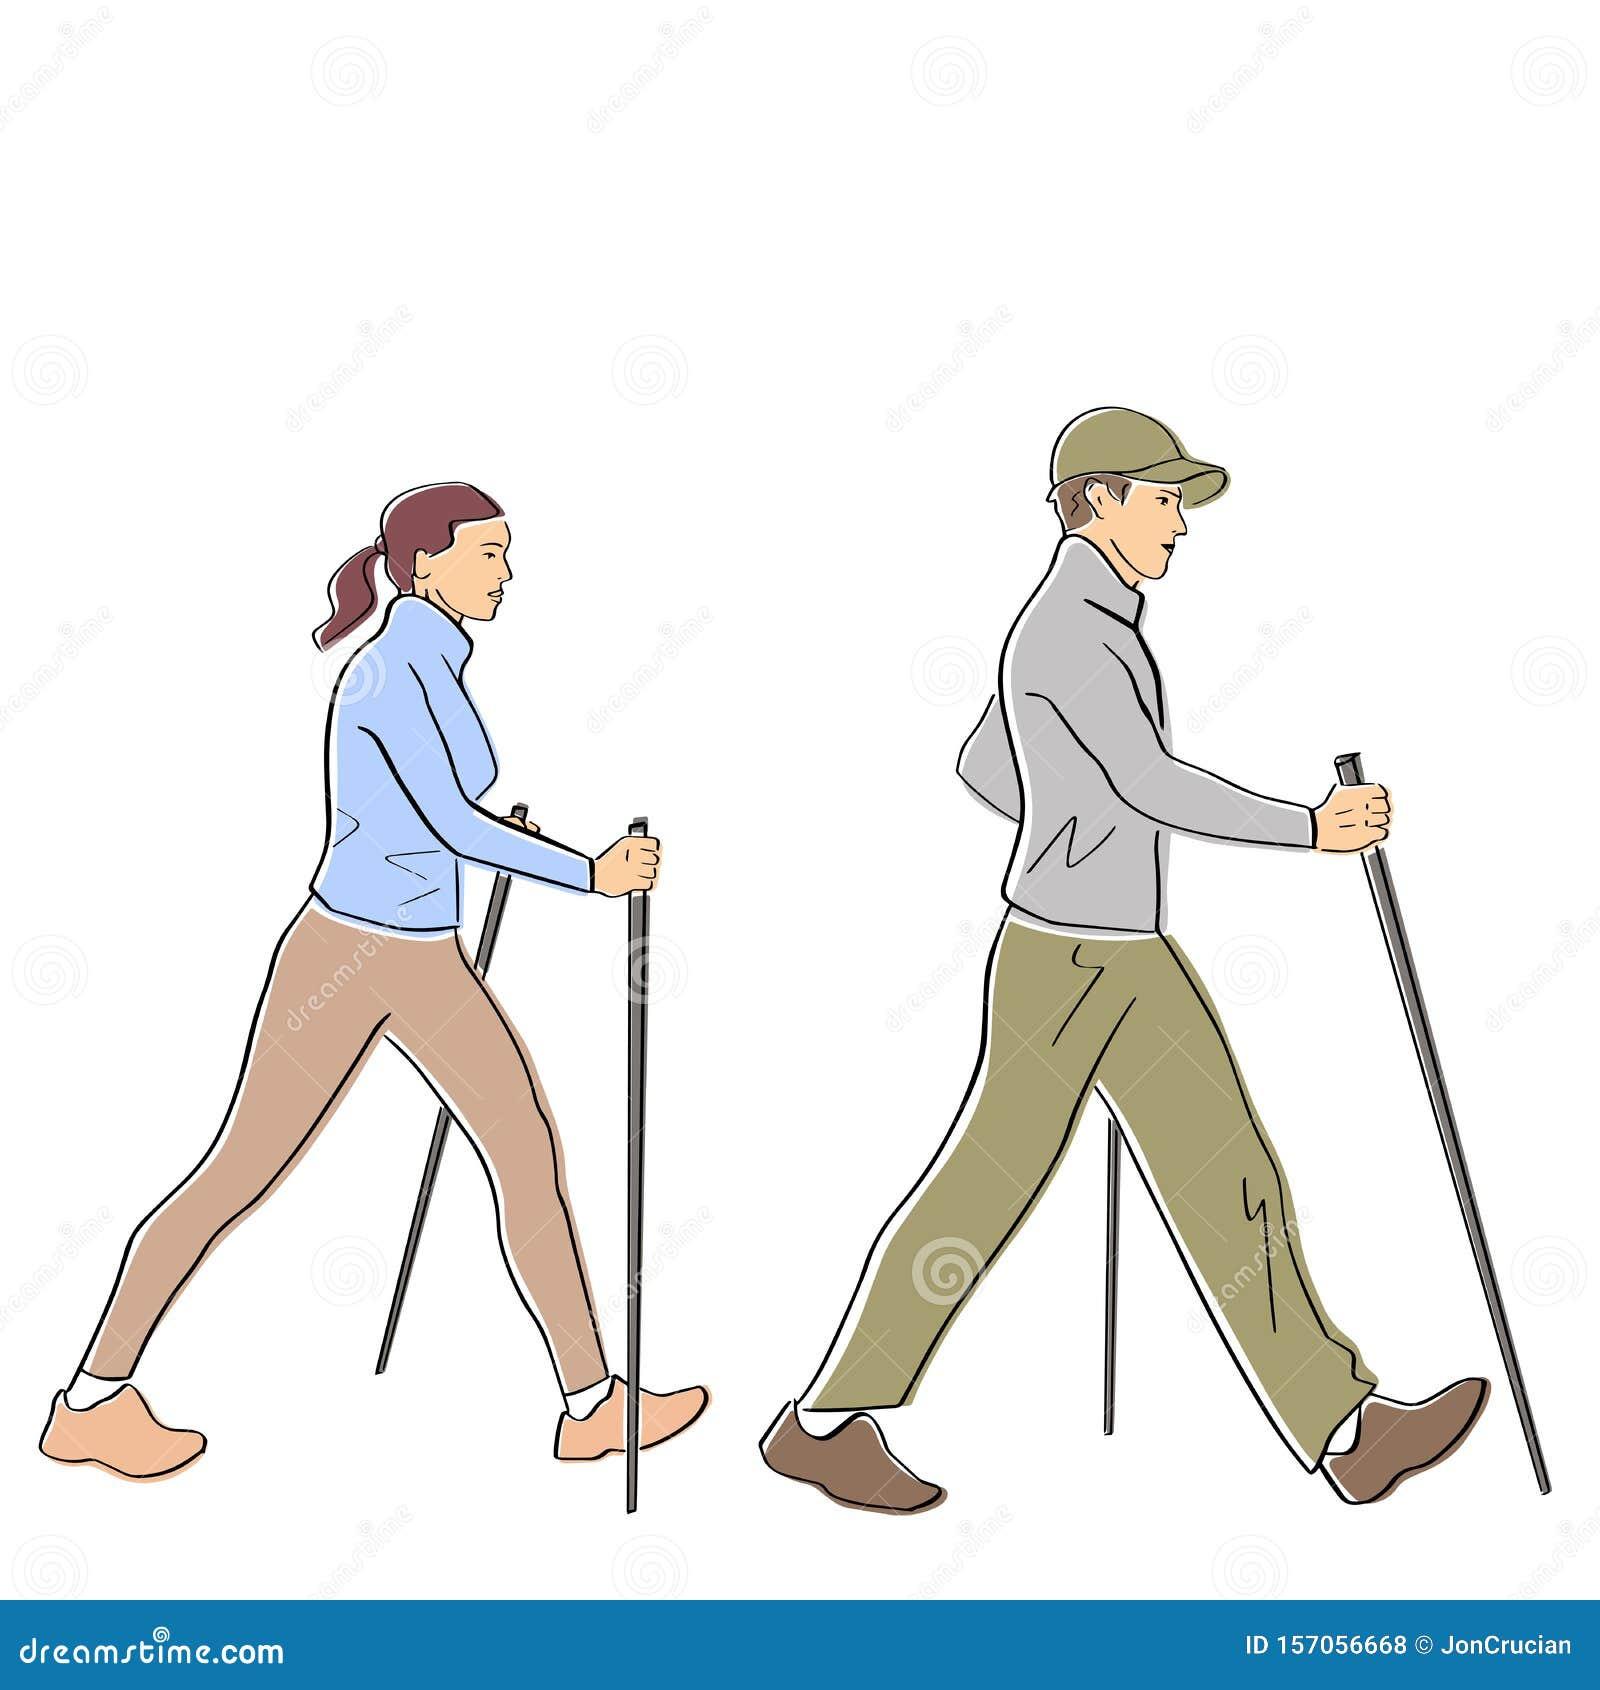 Nordic or scandinavian walking.